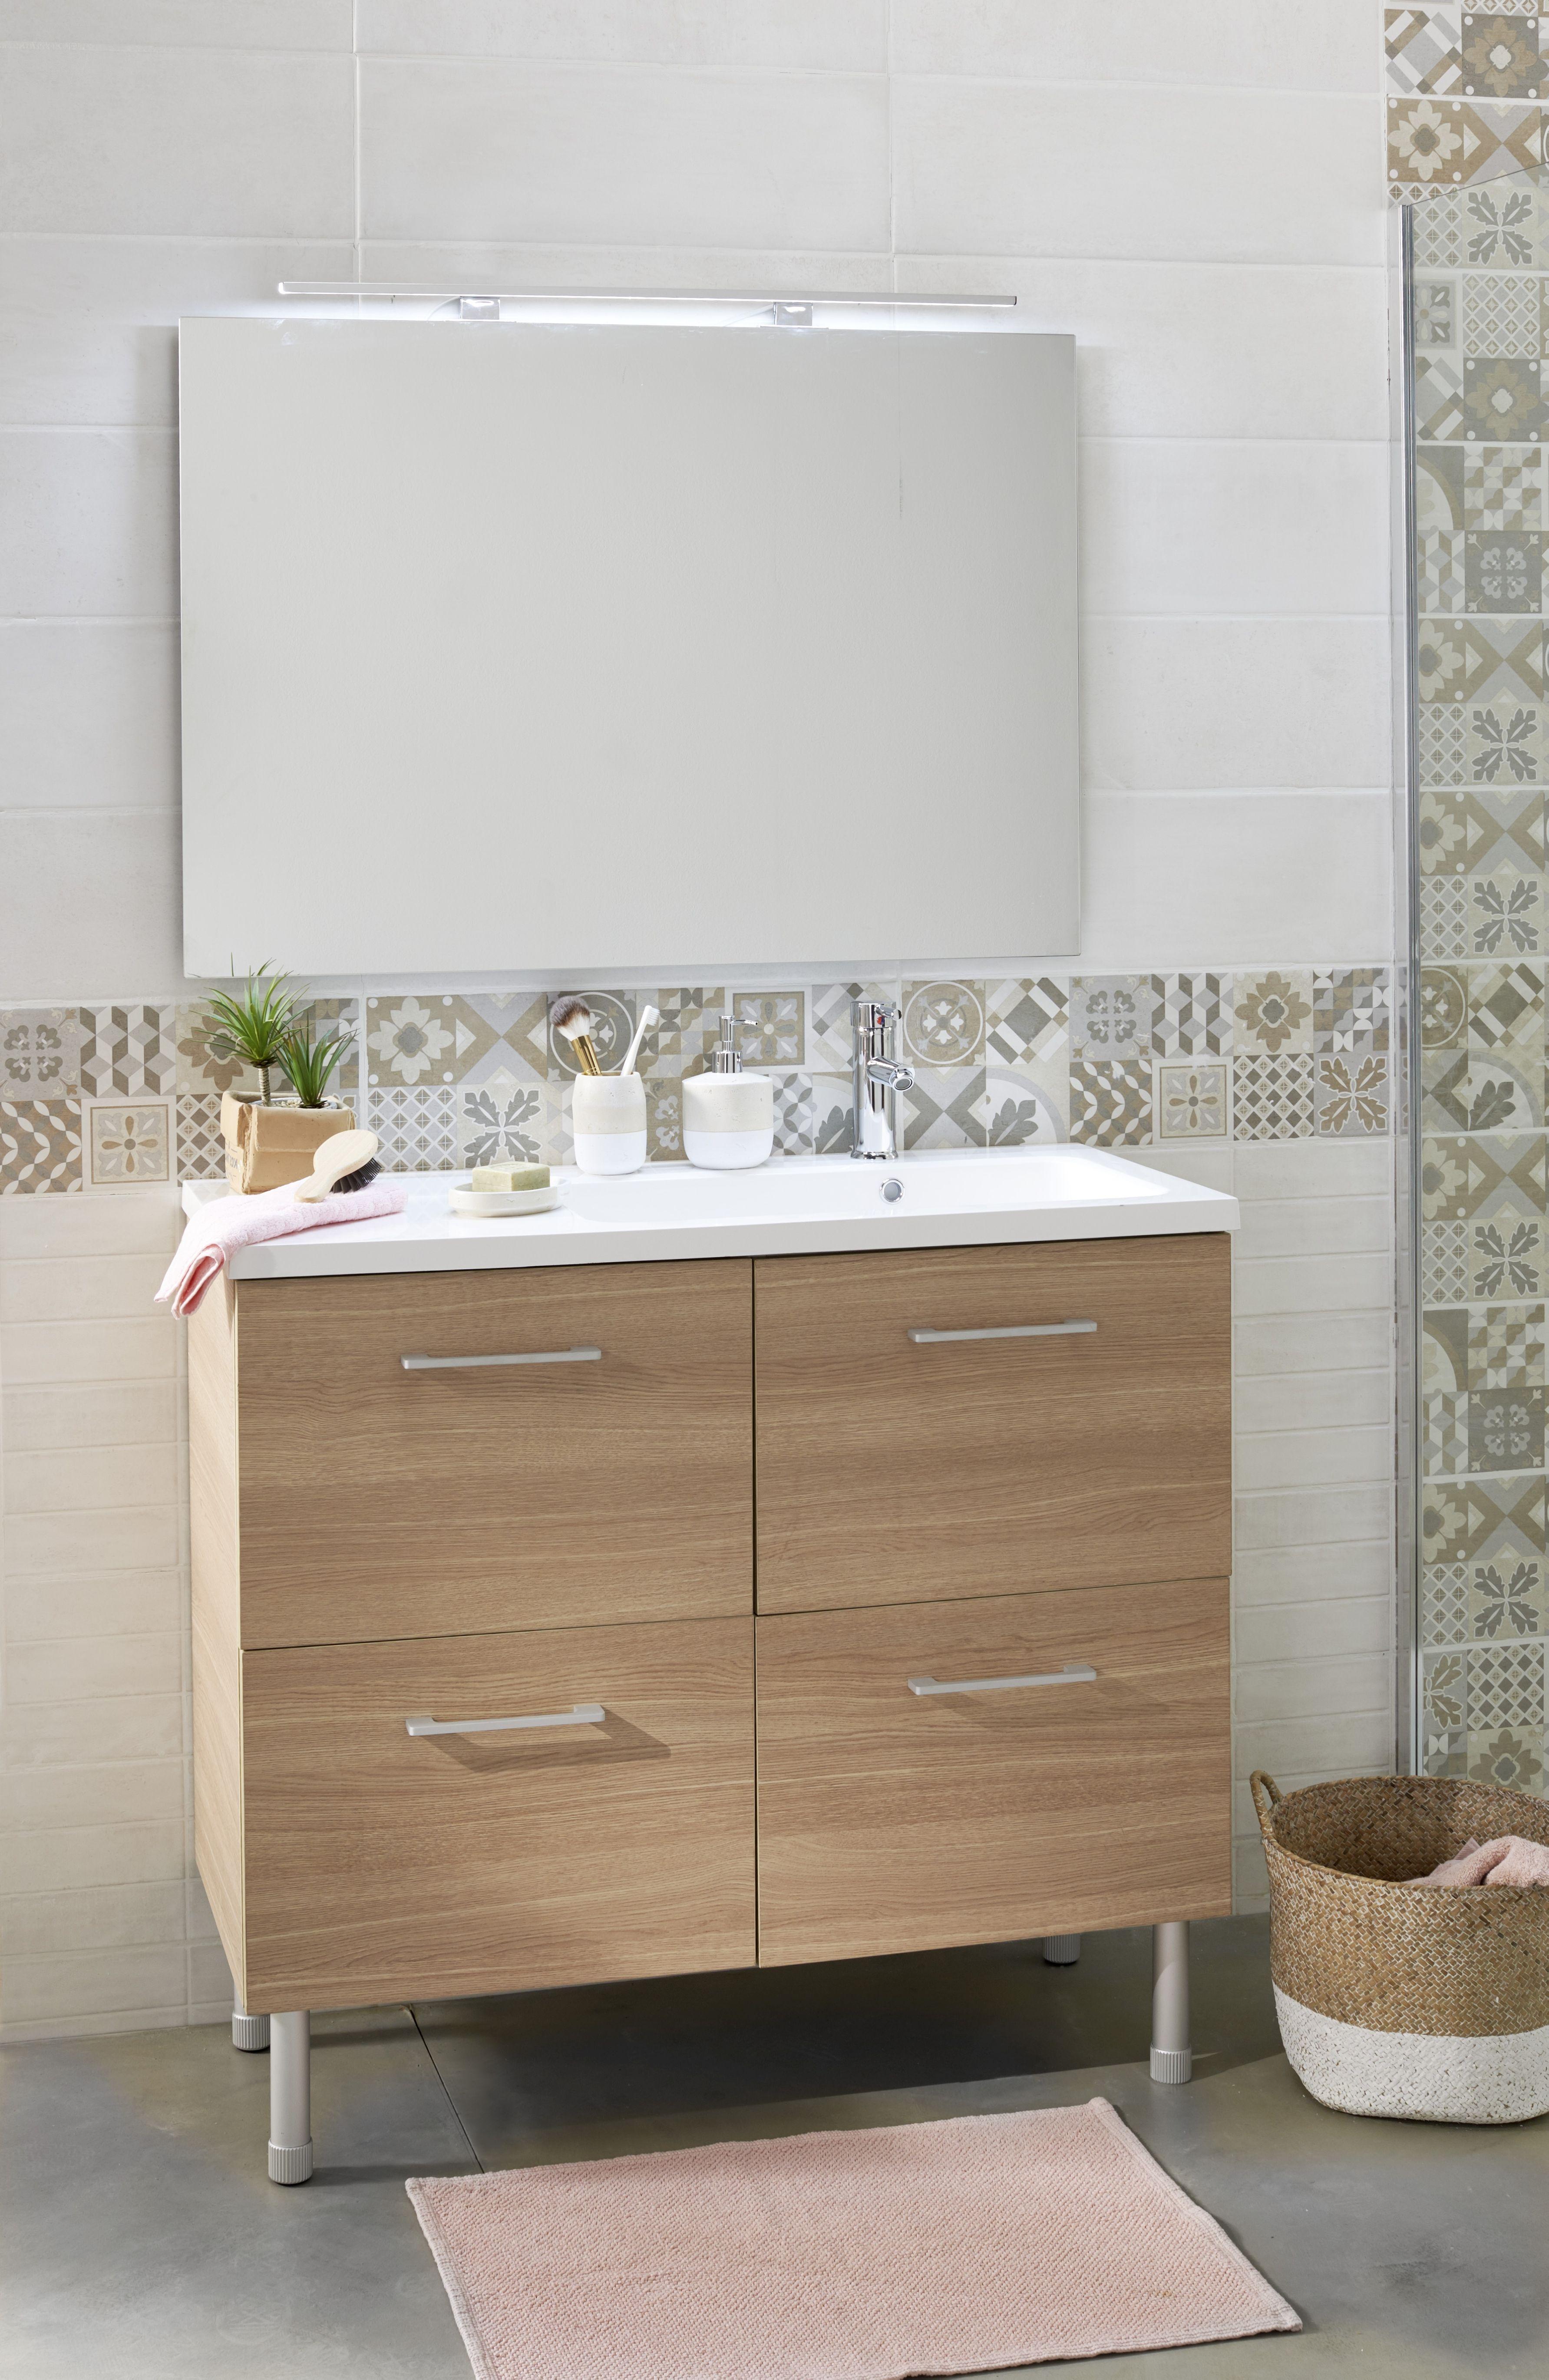 choisir le bon meuble pour aller dans sa salle de bain bricomarche bricofamily monprojetbrico salledebain meuble decoration